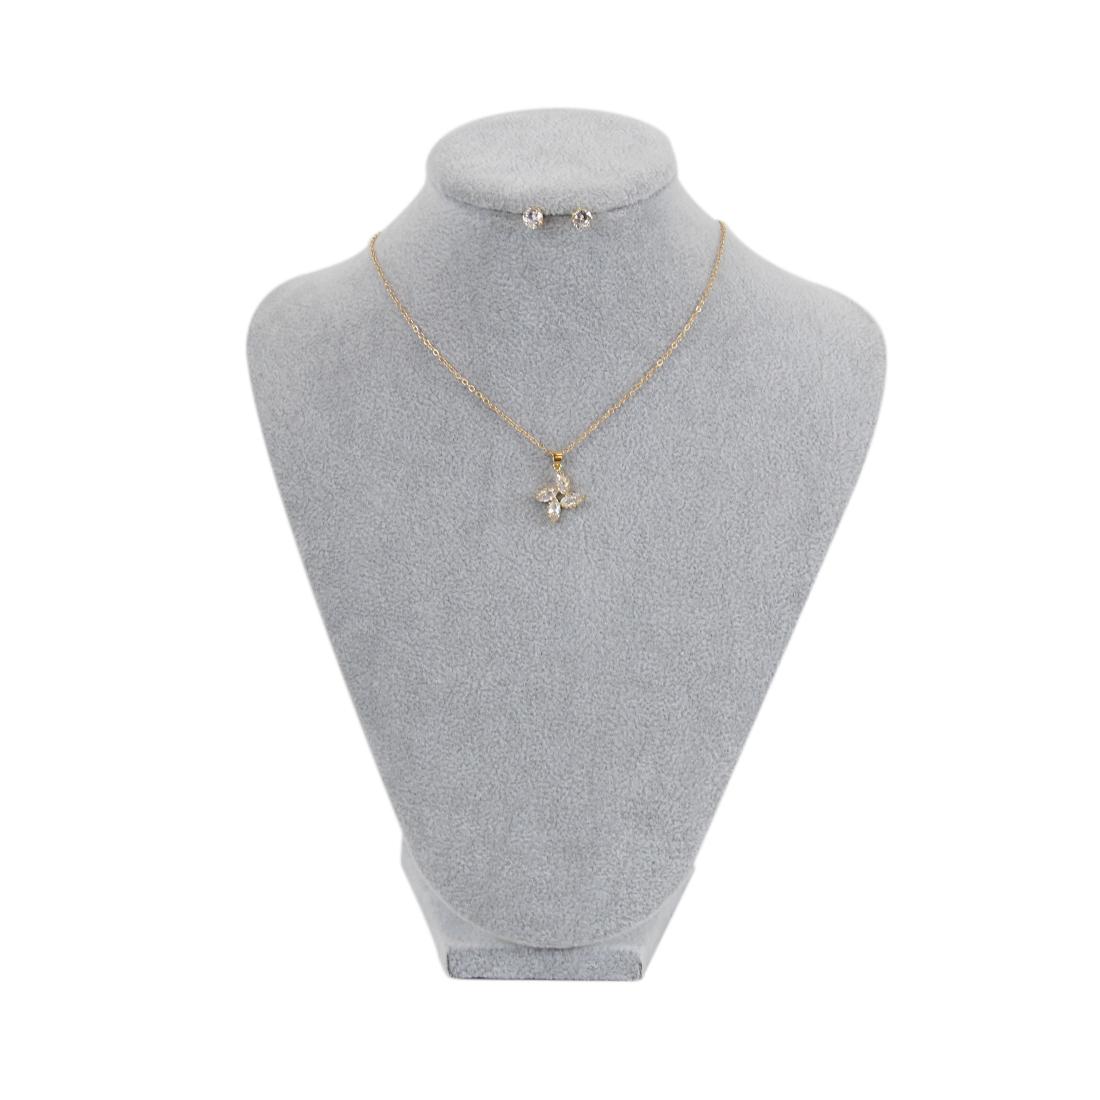 Diamond earrings with flower medal